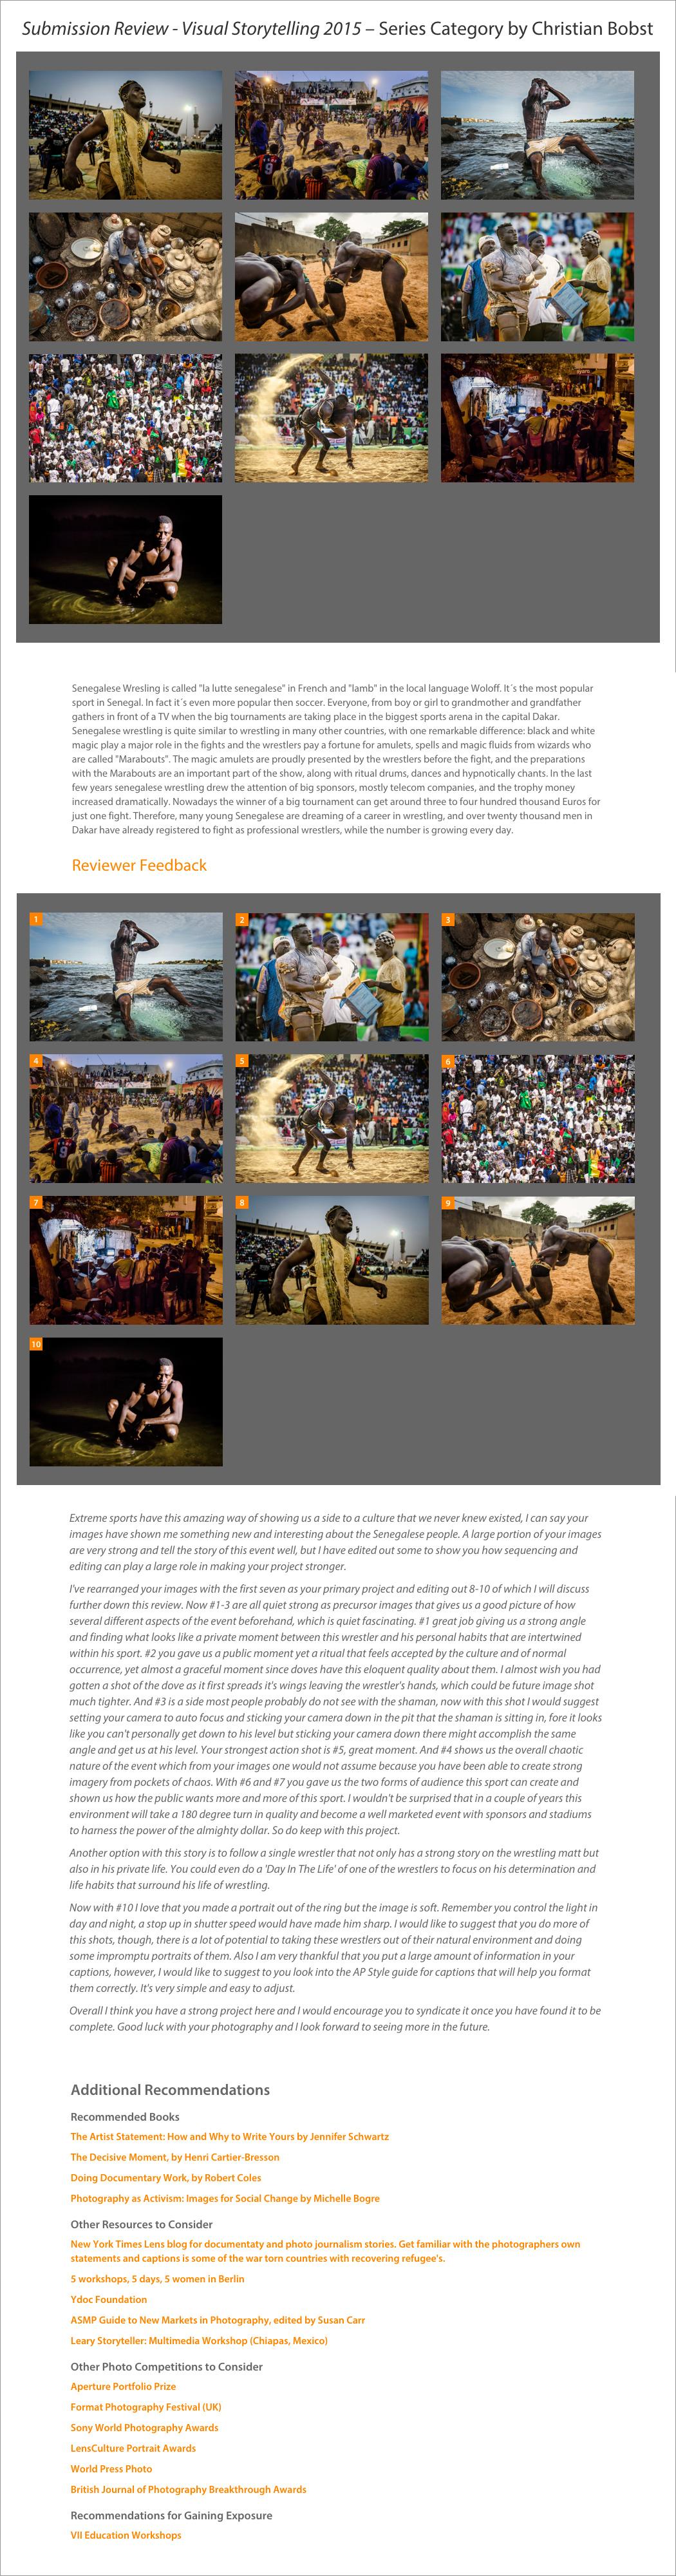 Selcuk Yücel | Street Photography Awards 2017 Entry